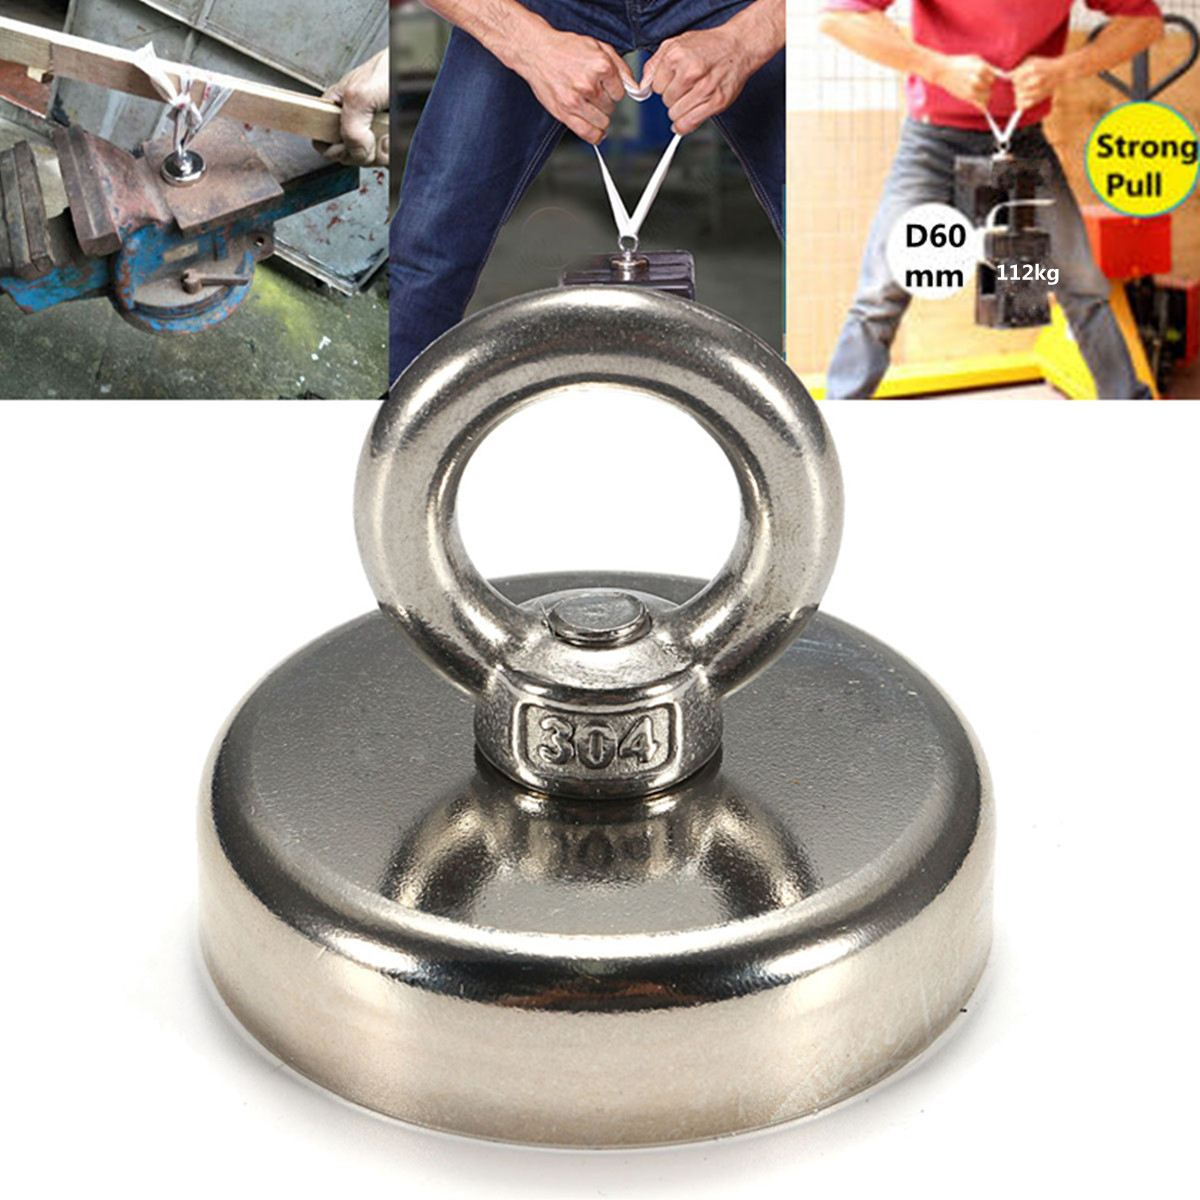 60mmx50mm Neodymium ferrum boron Magnets 304 Steel Ring Magnets 112KG 1Pcs Magnet Powerful Permanent Magnetic ferrum